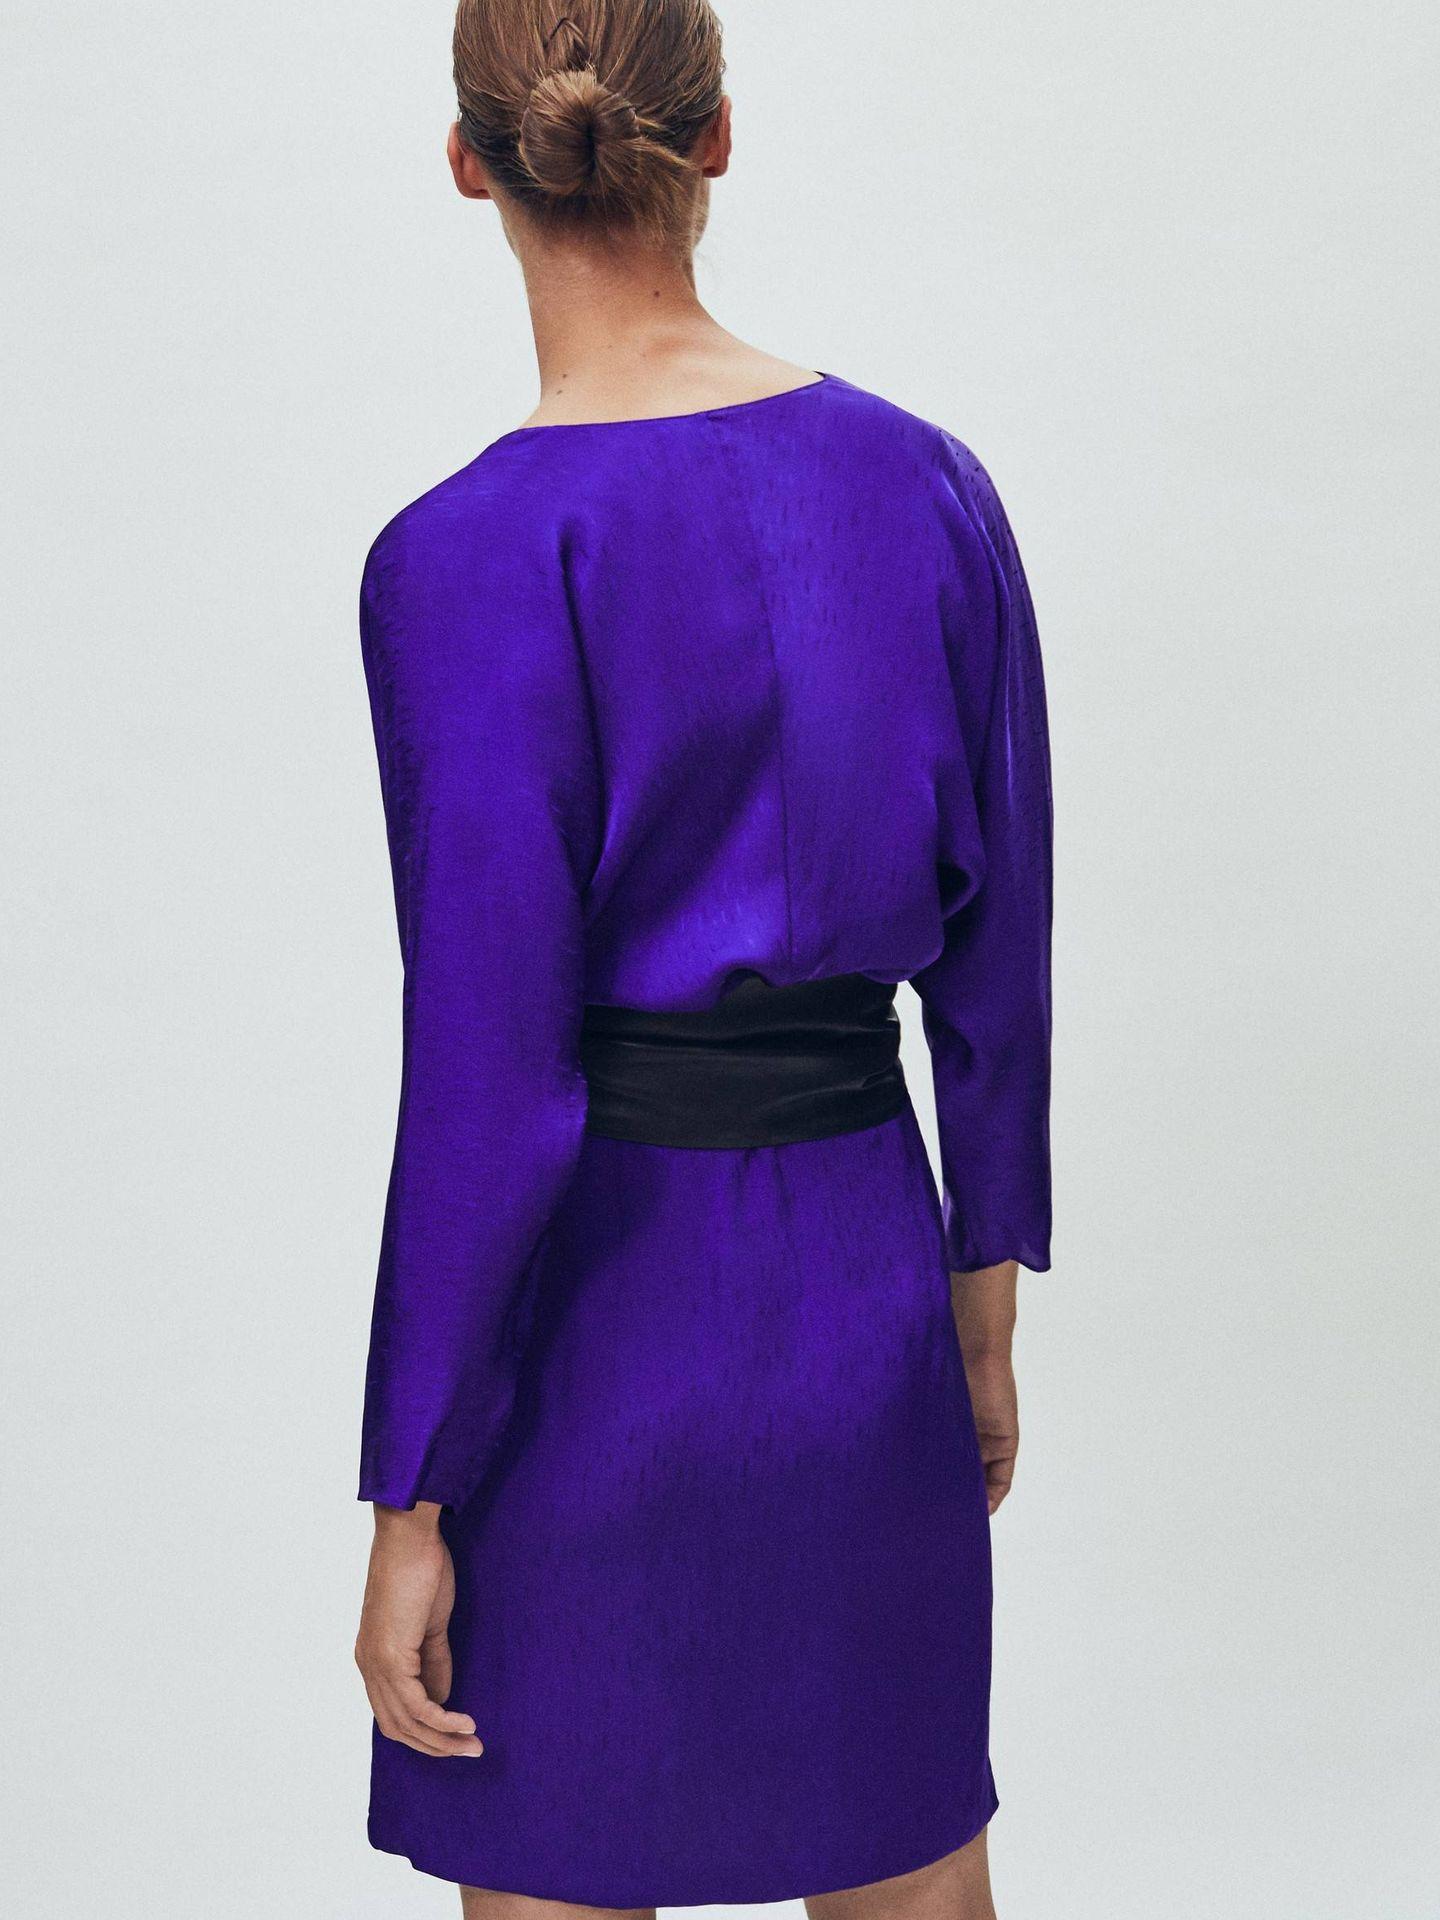 Vestido de invitada de Massimo Dutti. (Cortesía)